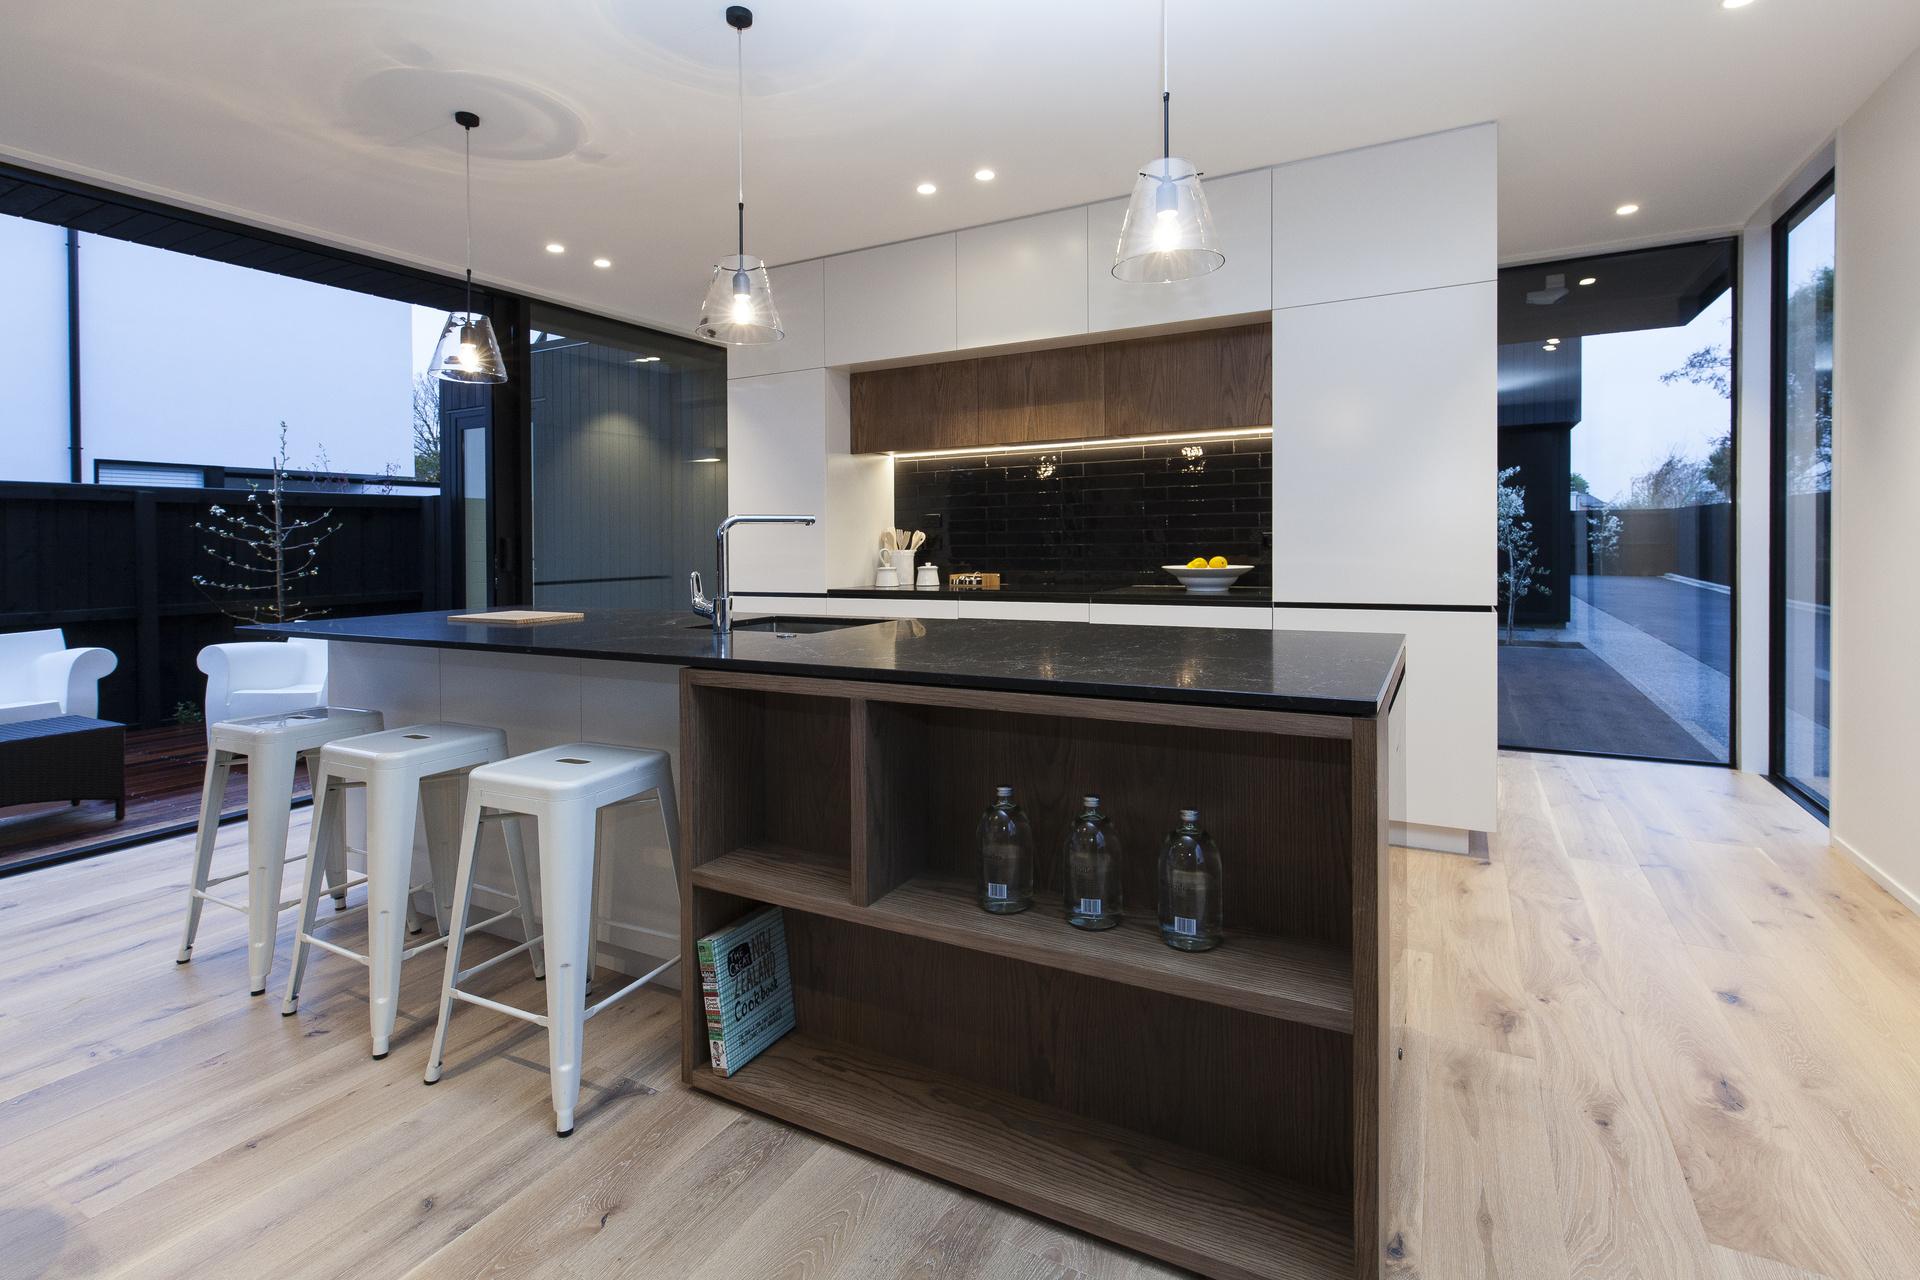 378 Durham Street - kitchen shelving